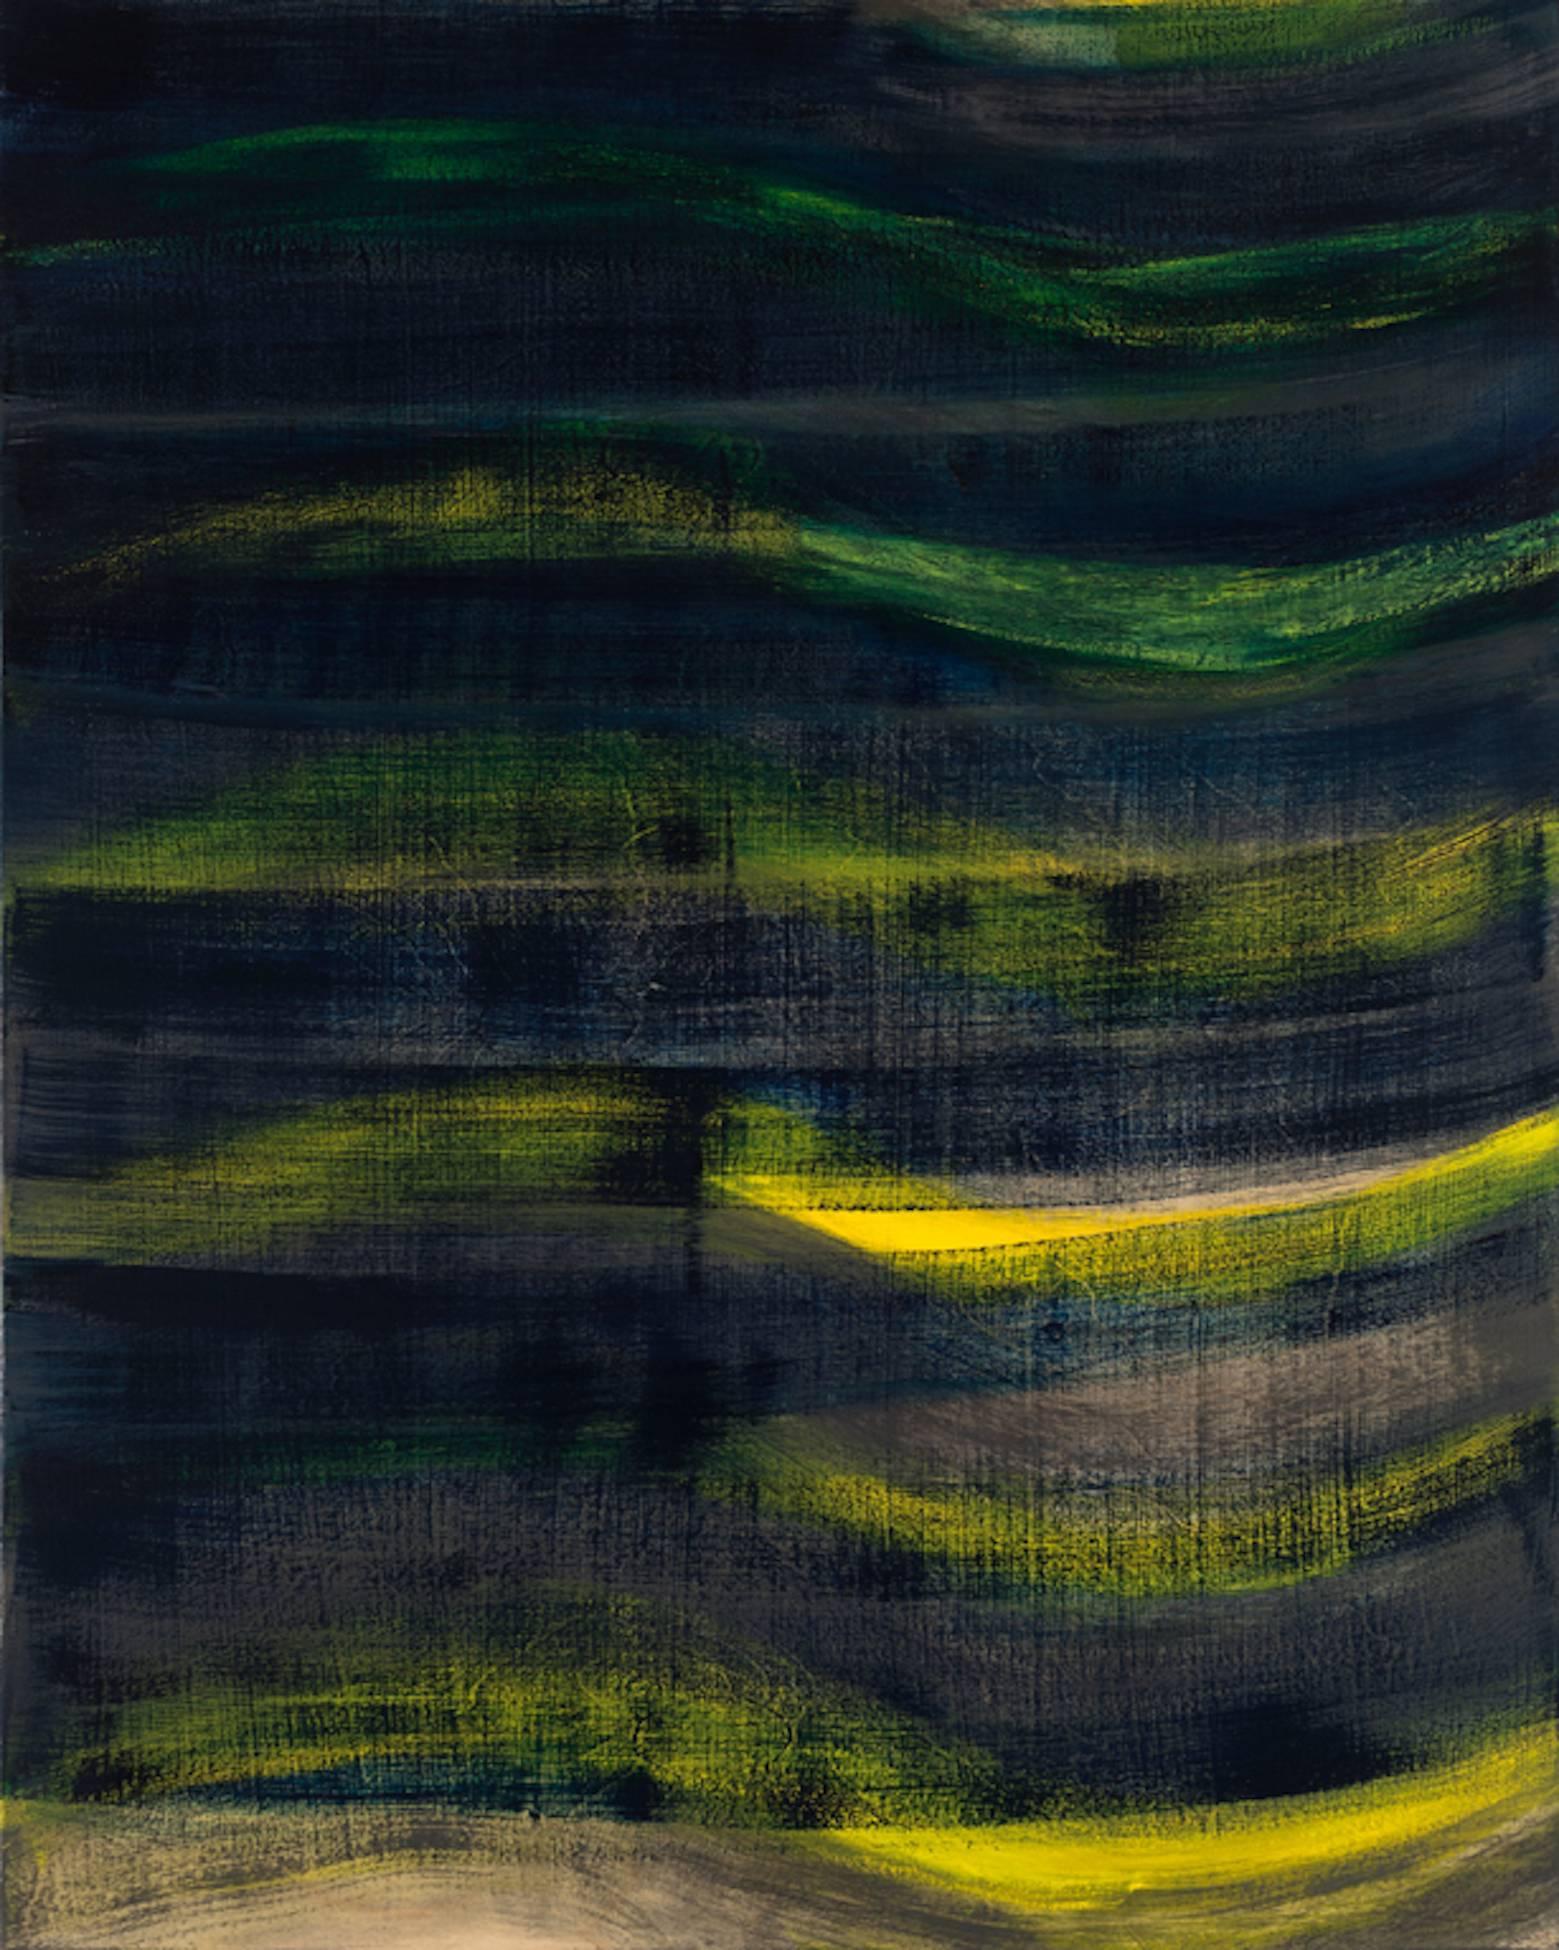 Emily Berger, Audubon, 2014, oil paint, wood panel, Abstraction